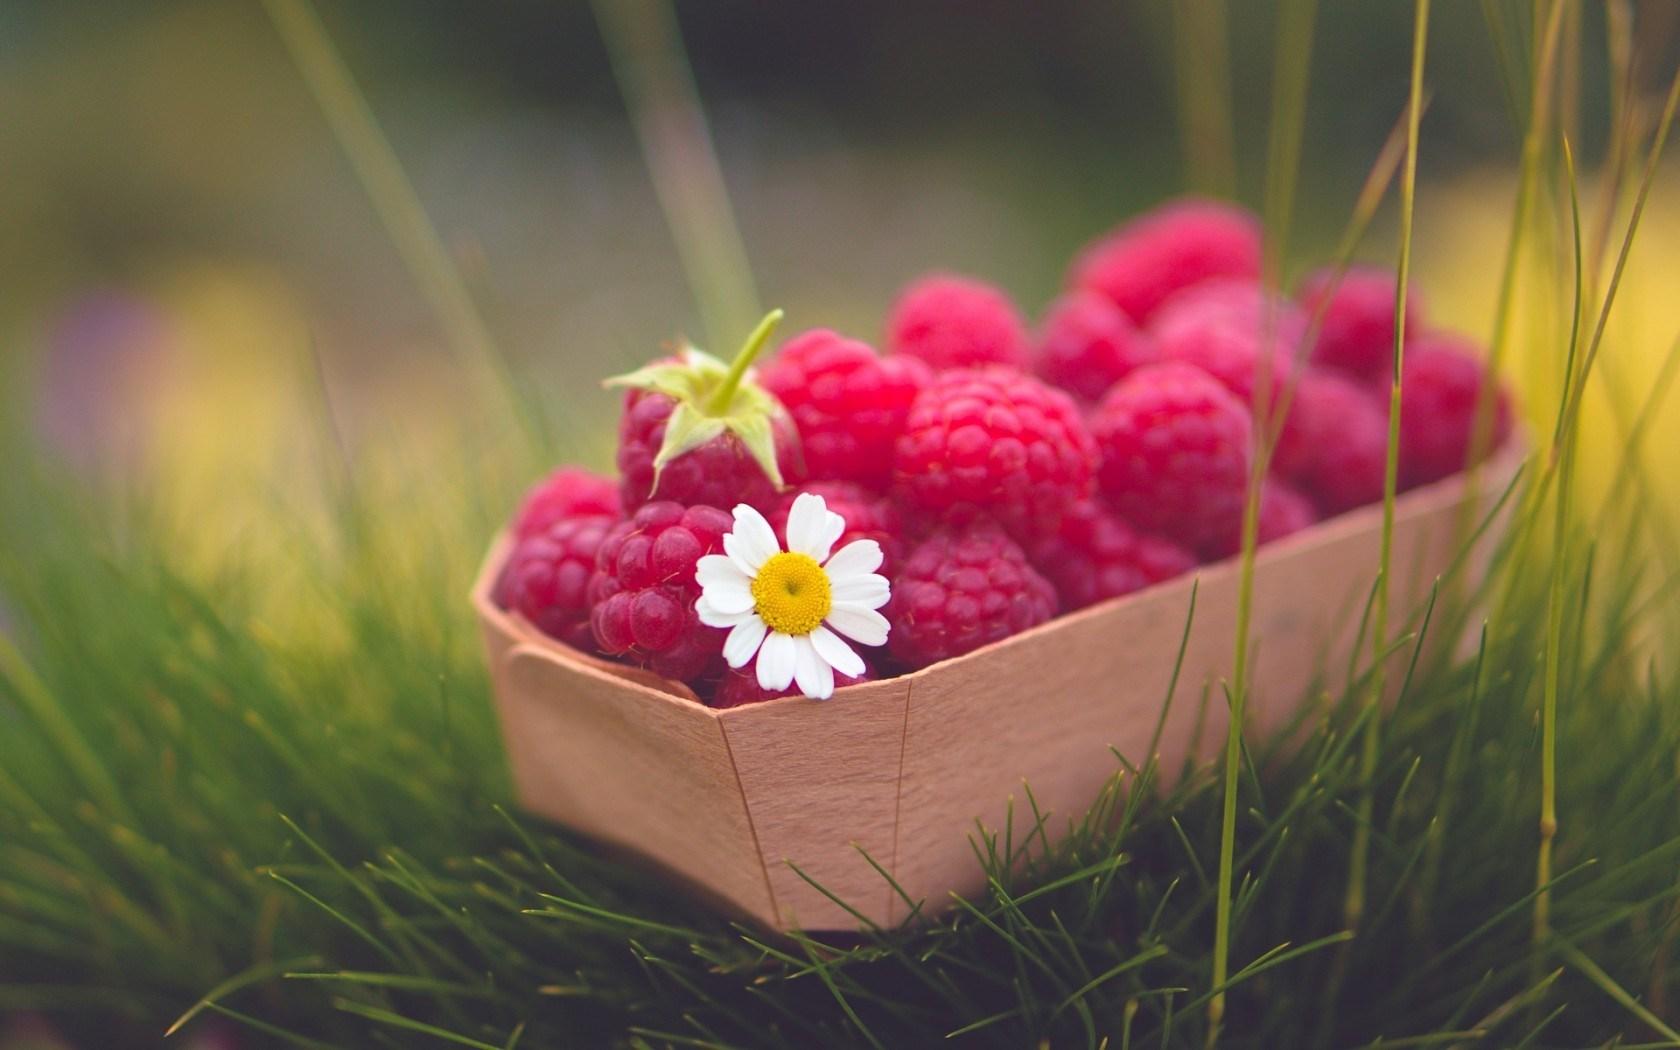 Food Raspberries Berry Daisy Flower Grass Nature